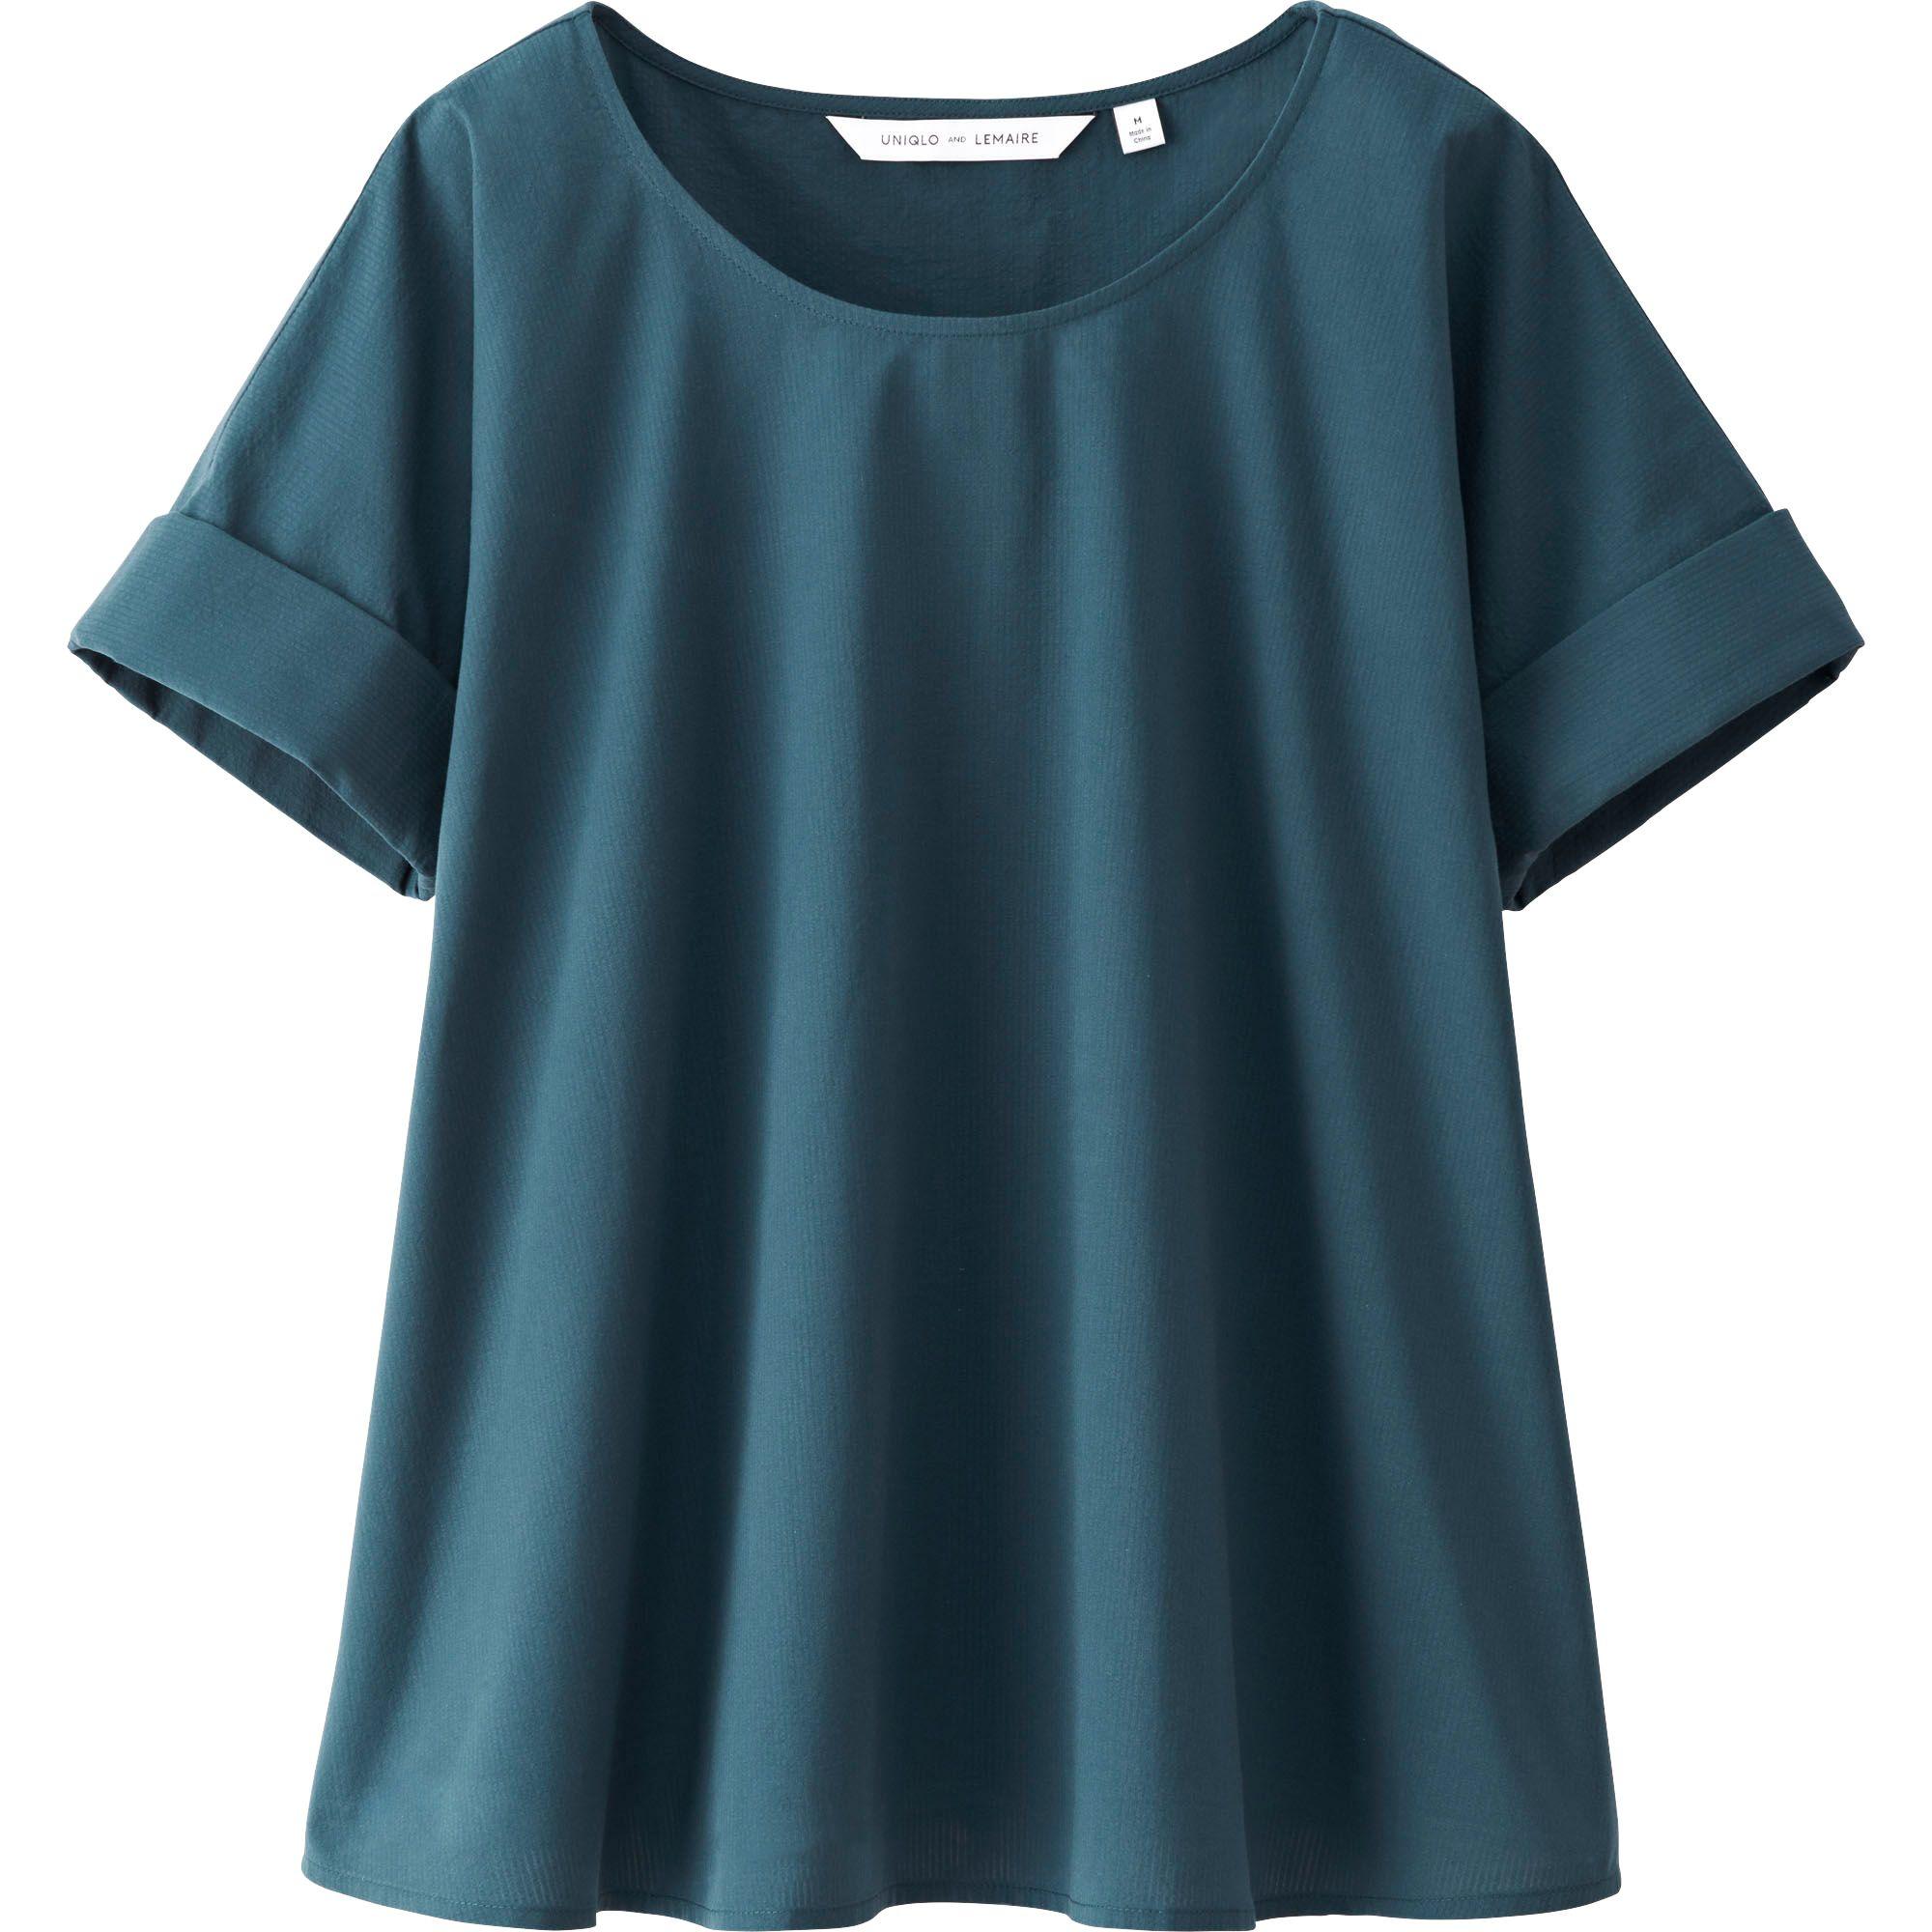 Womens Blue Short Sleeve Blouse 30